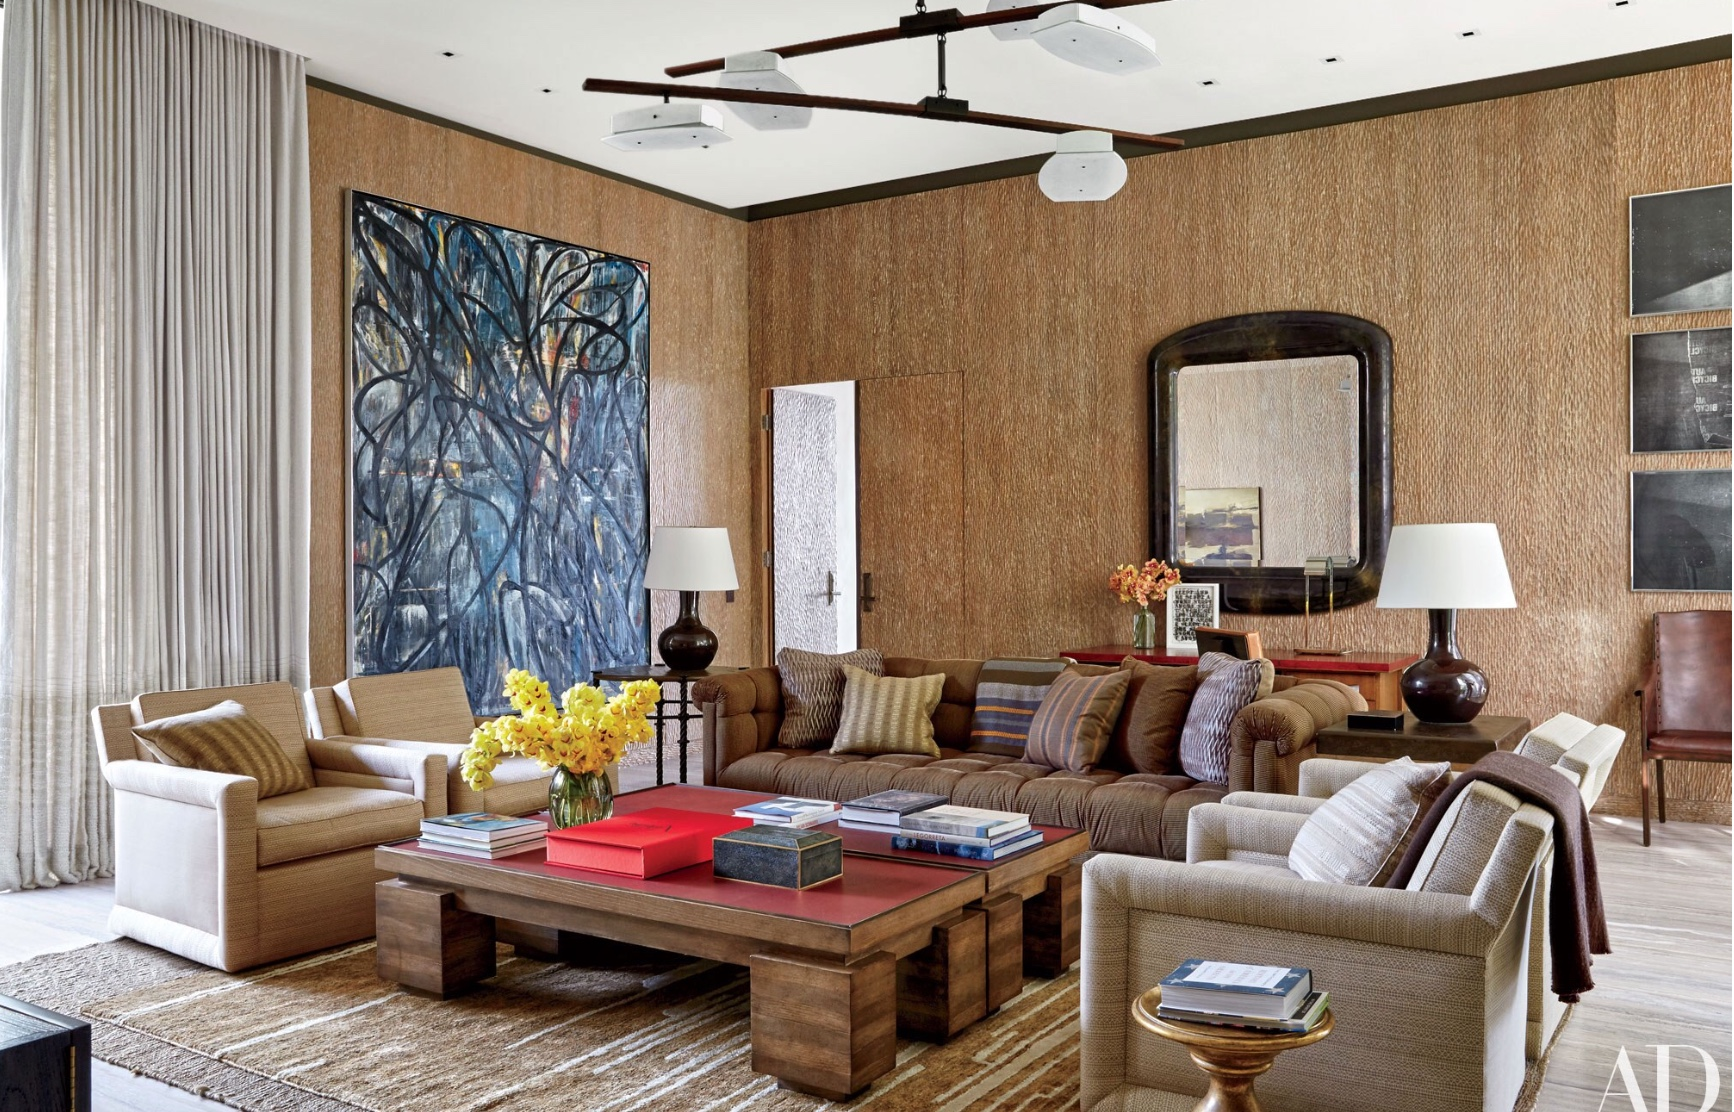 Palm Springs Style Via Michael S. Smith Living Room Via Belle Vivir Blog